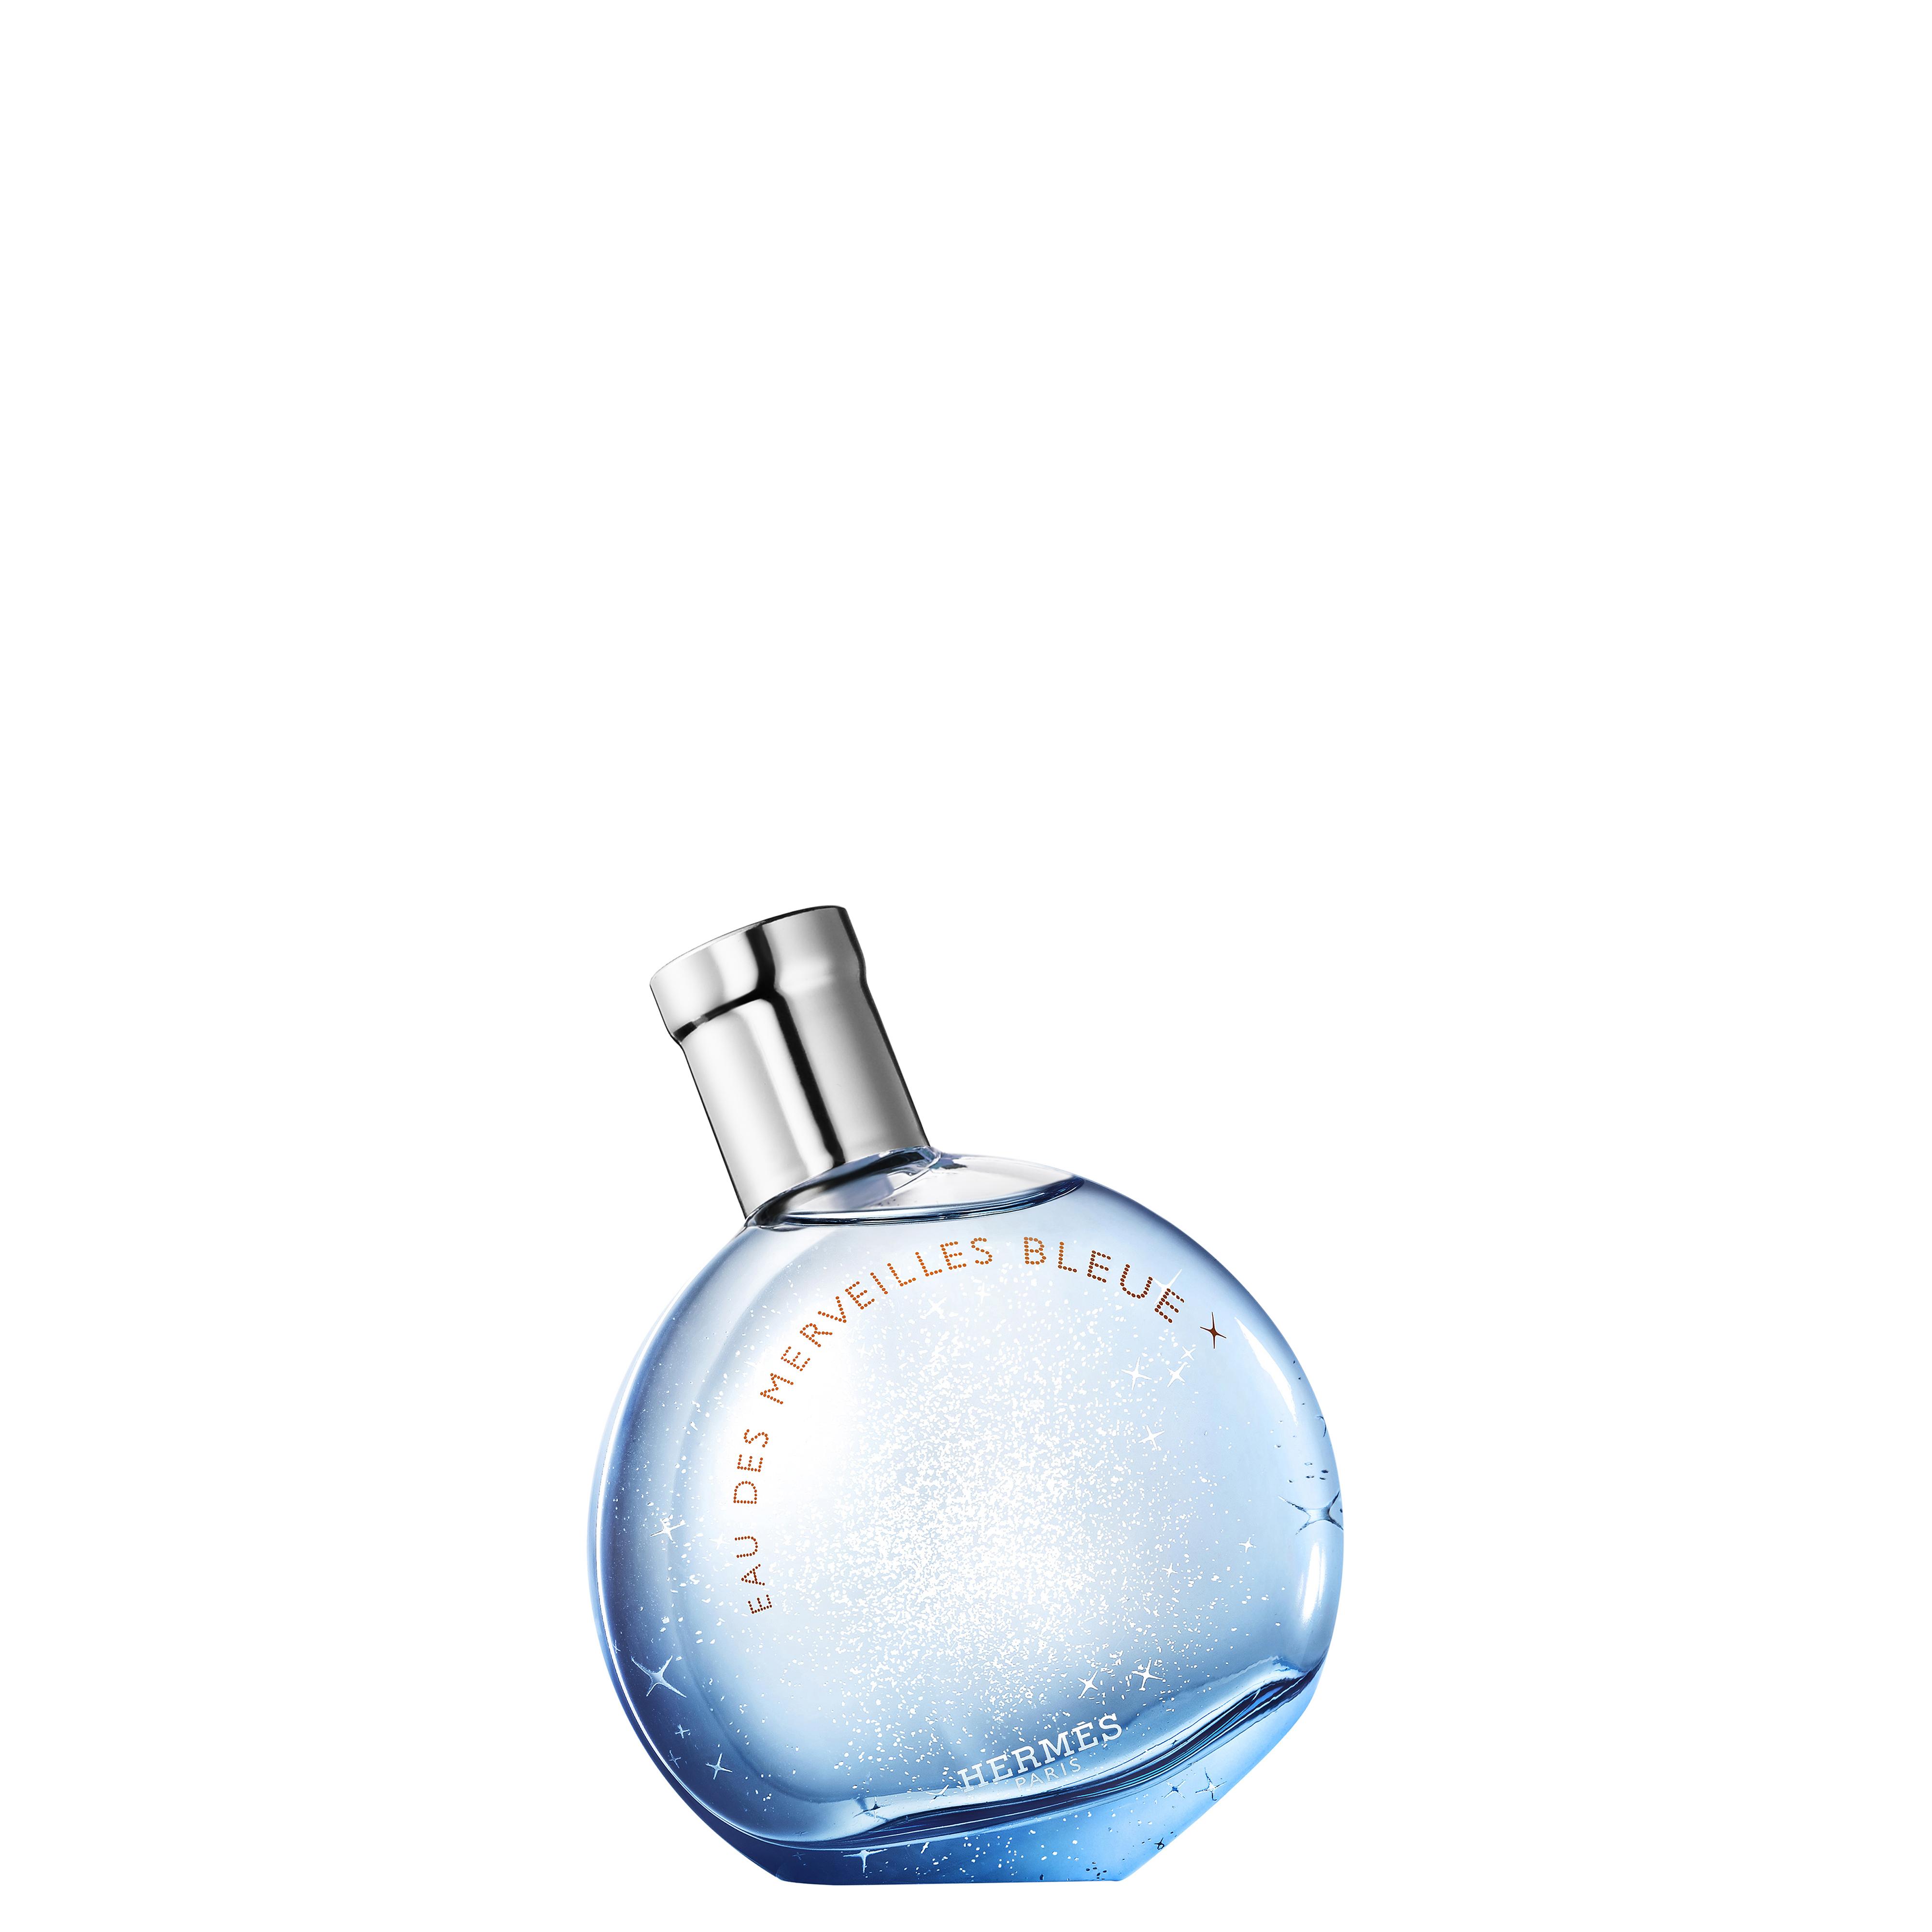 L'Ombre Des Merveilles Eau de Parfum 30 ml HERMÈS KICKS